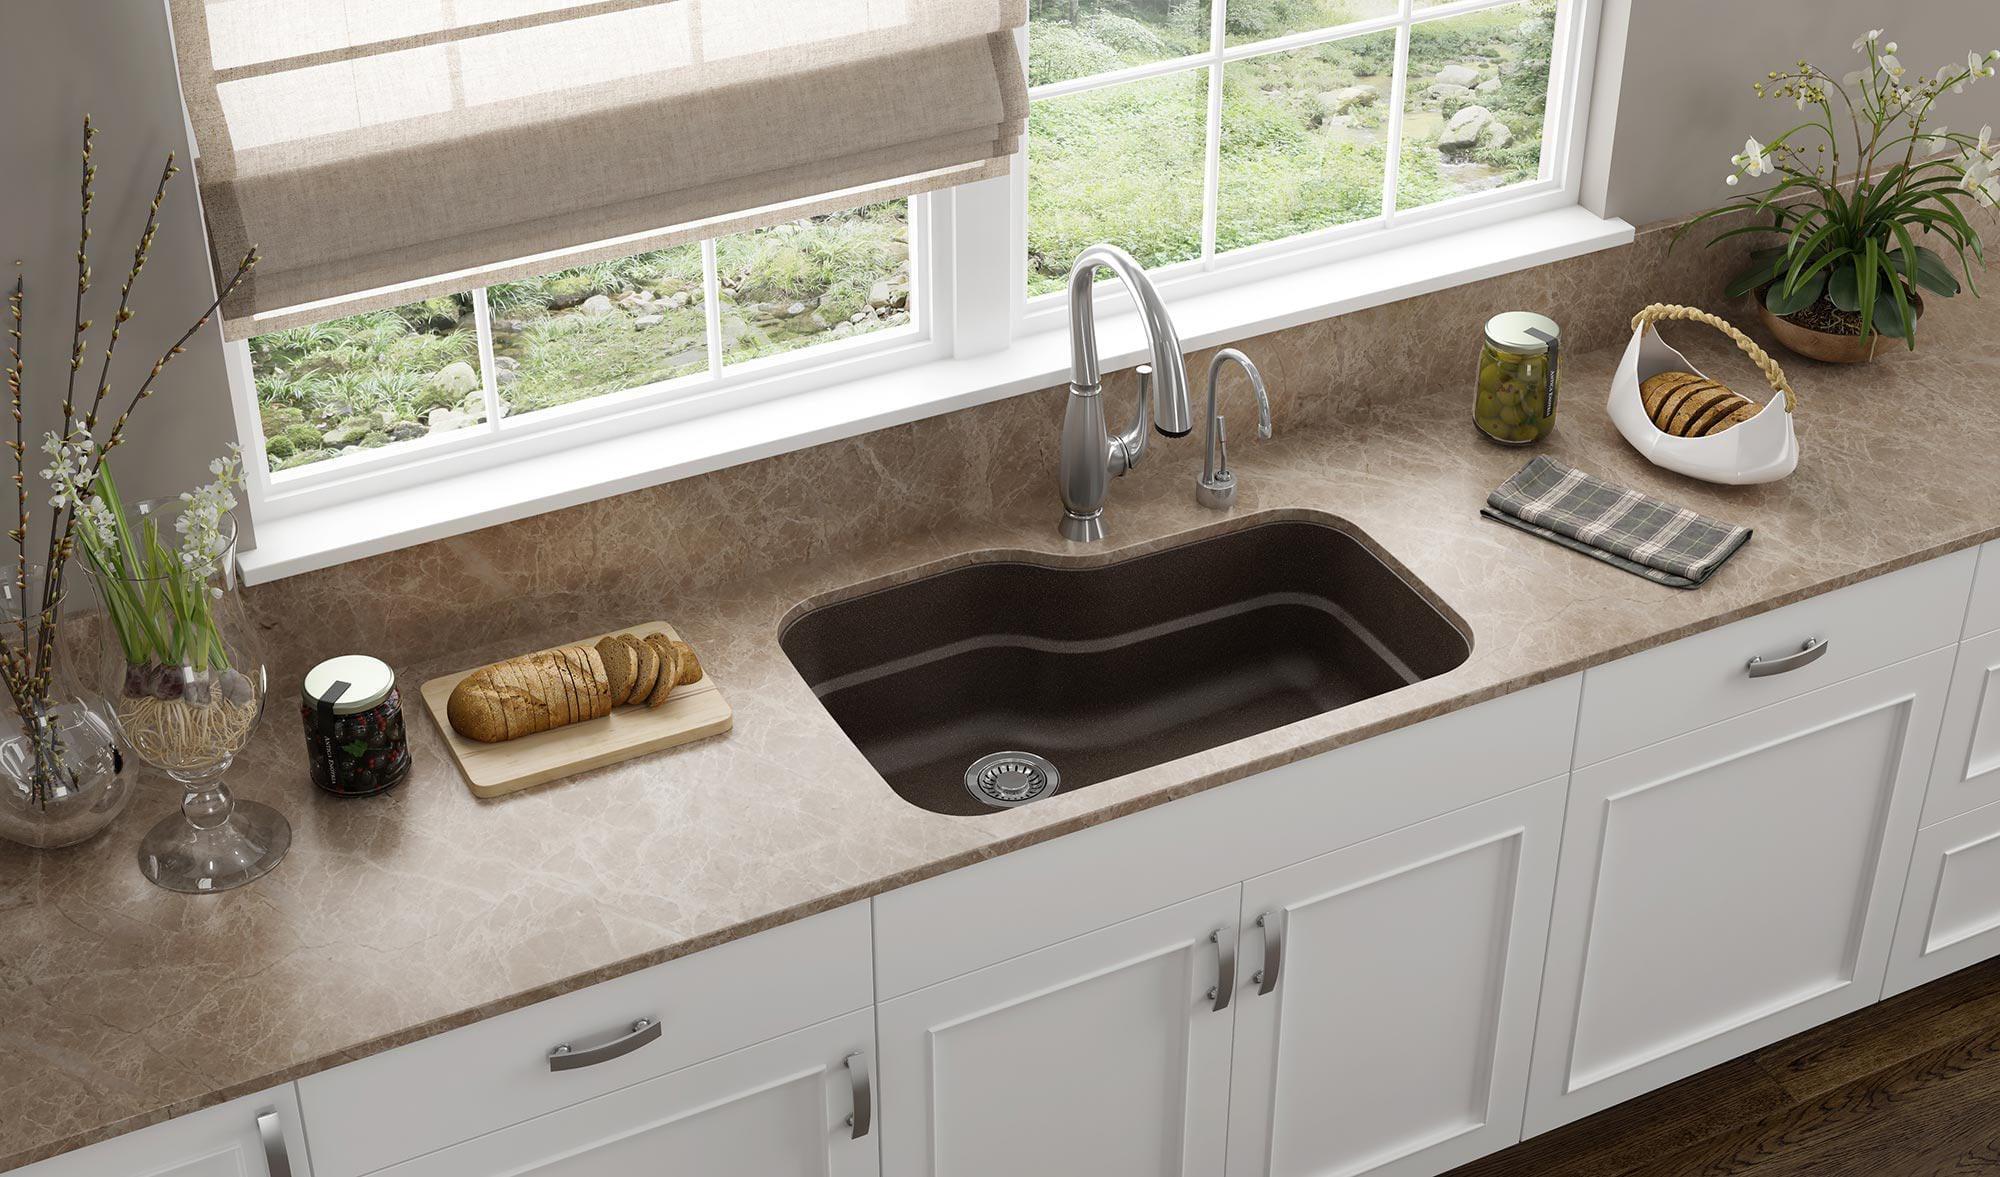 Franke orca 31 3 8 granite kitchen sink